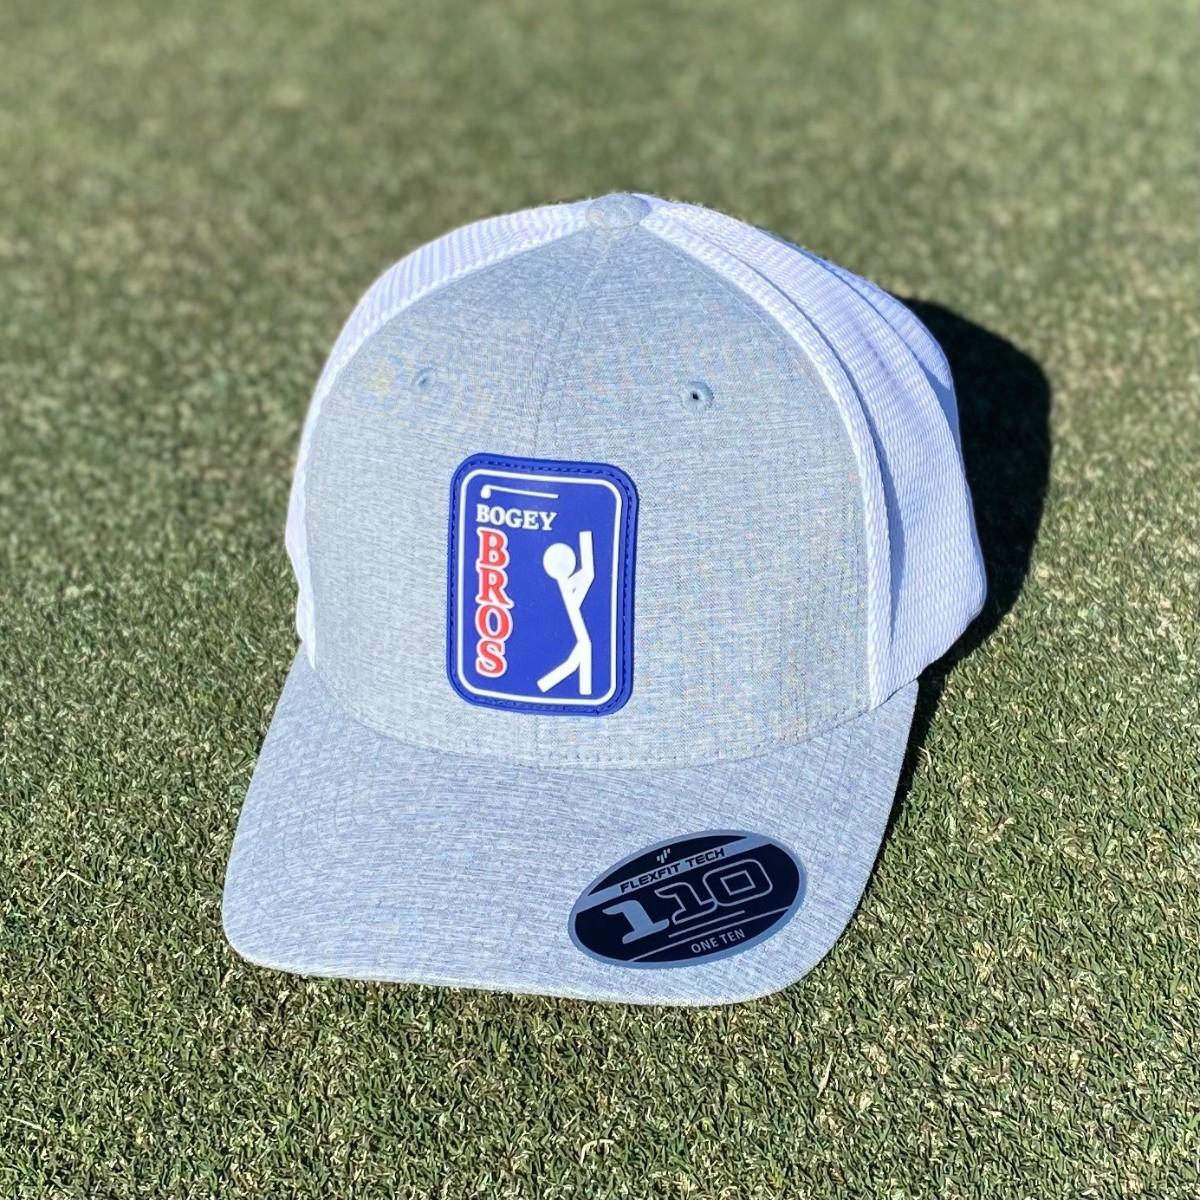 BBA - Funny Golf Hat.jpg